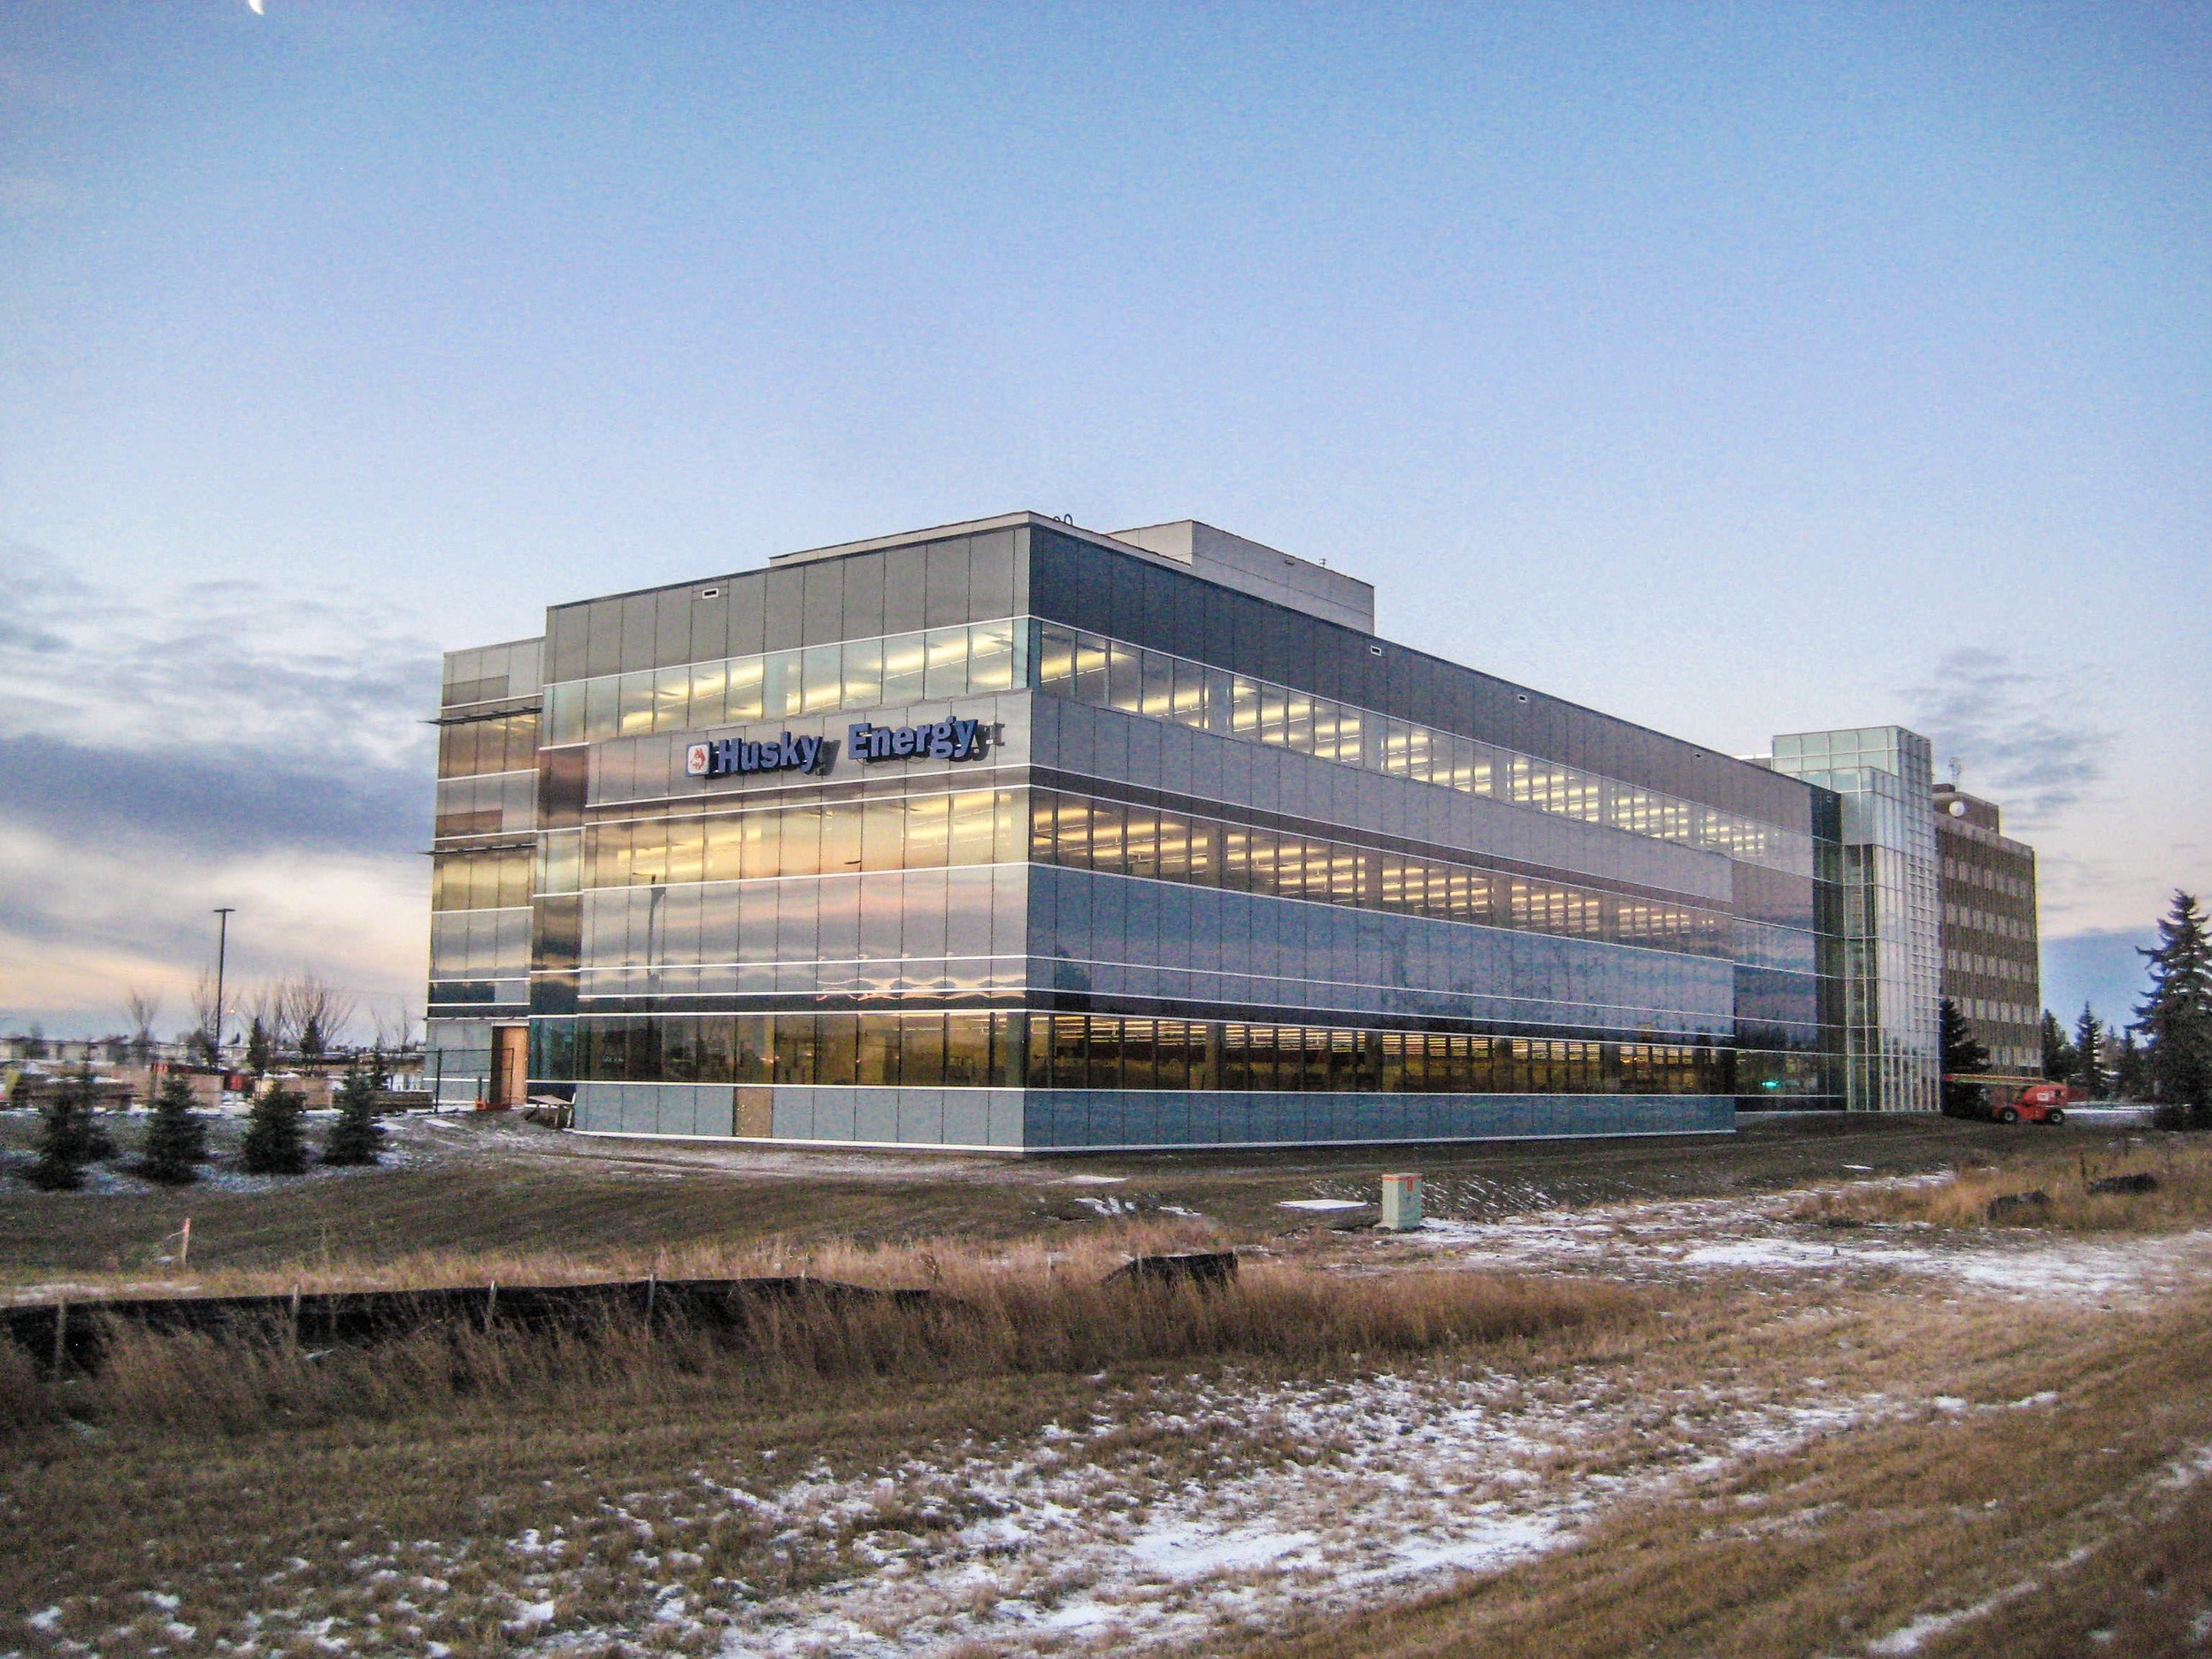 Husky Energy Office Building